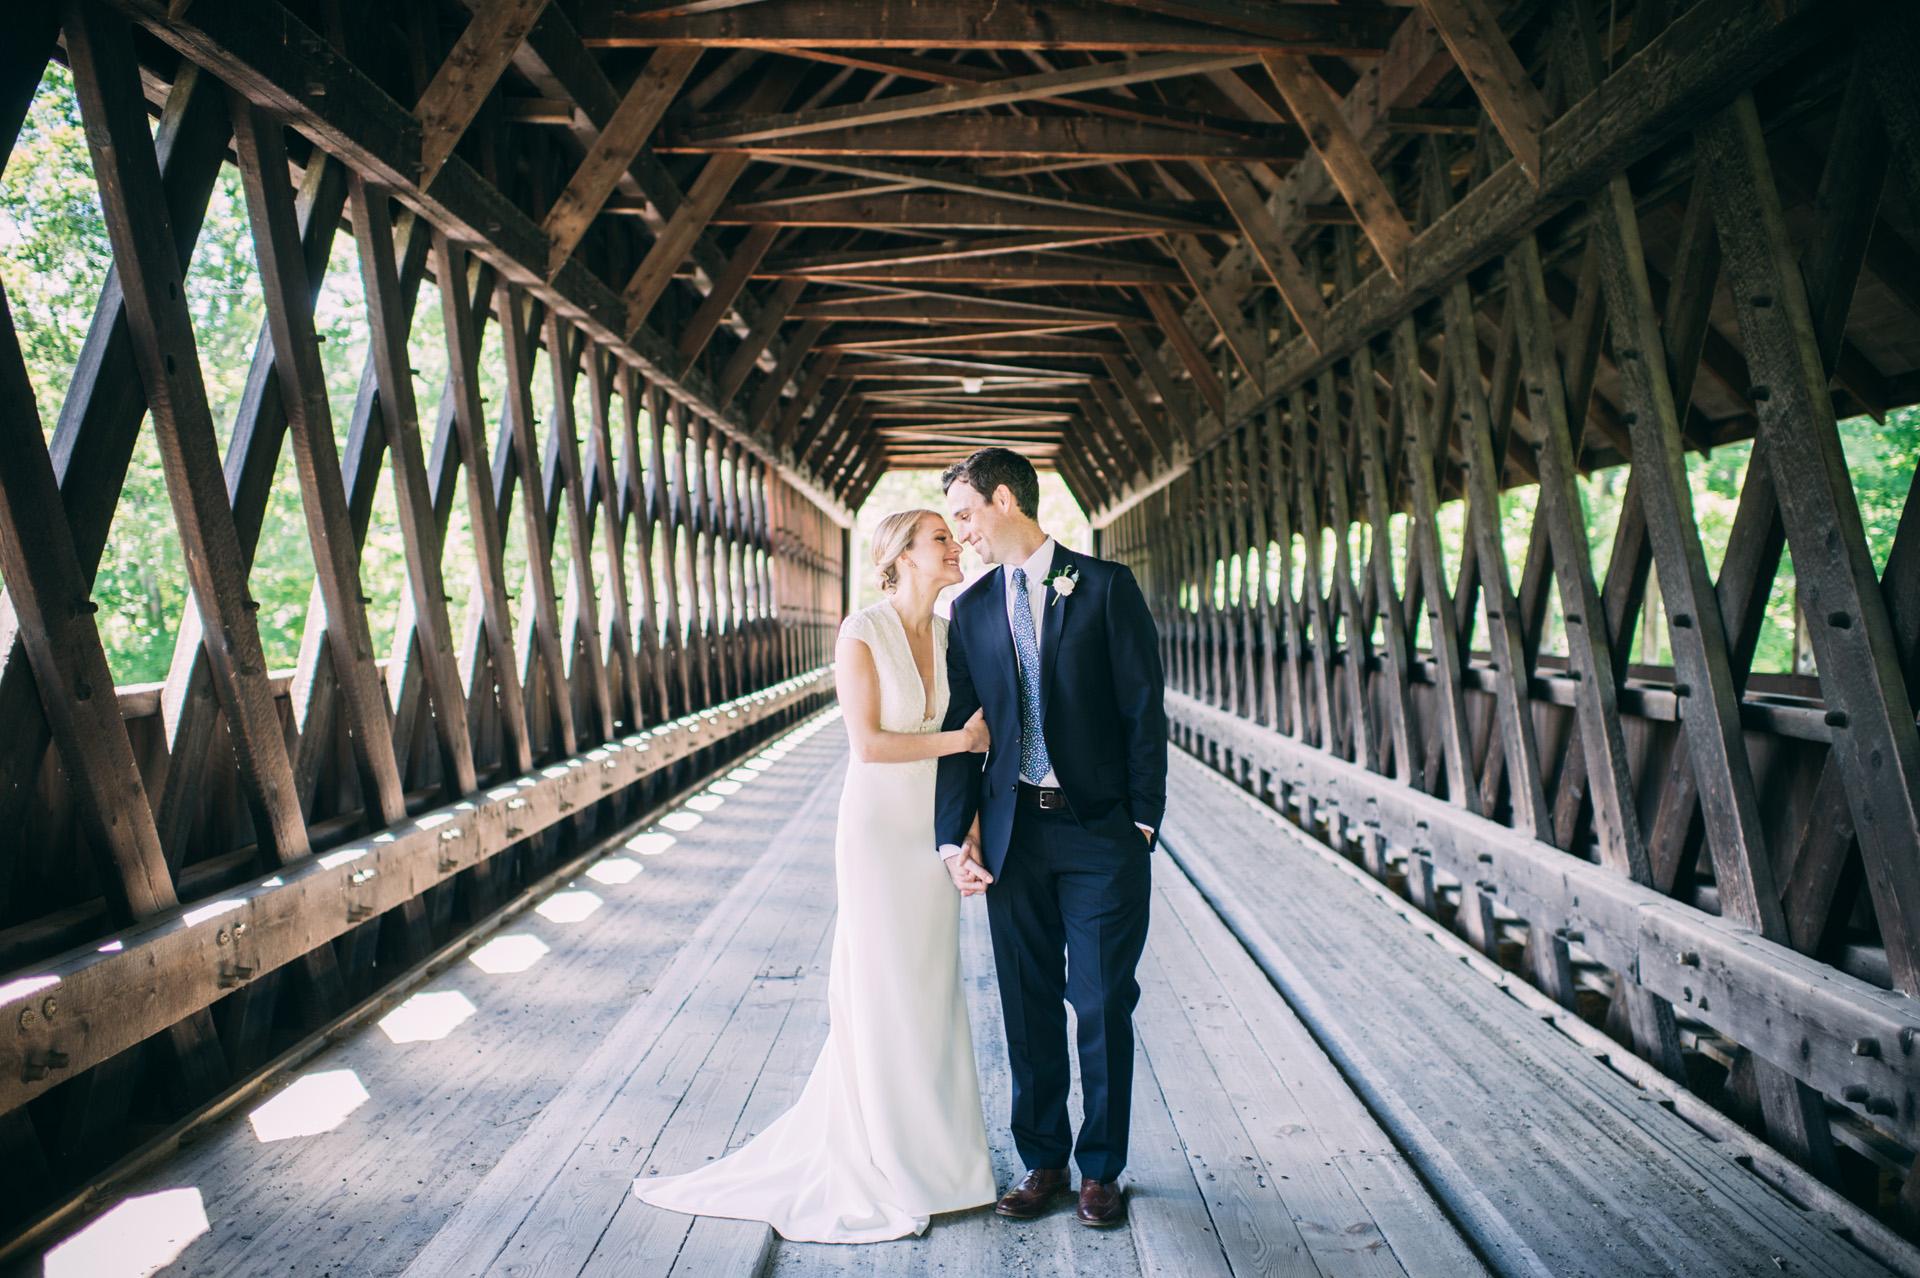 woodstock-inn-vermont-wedding-03